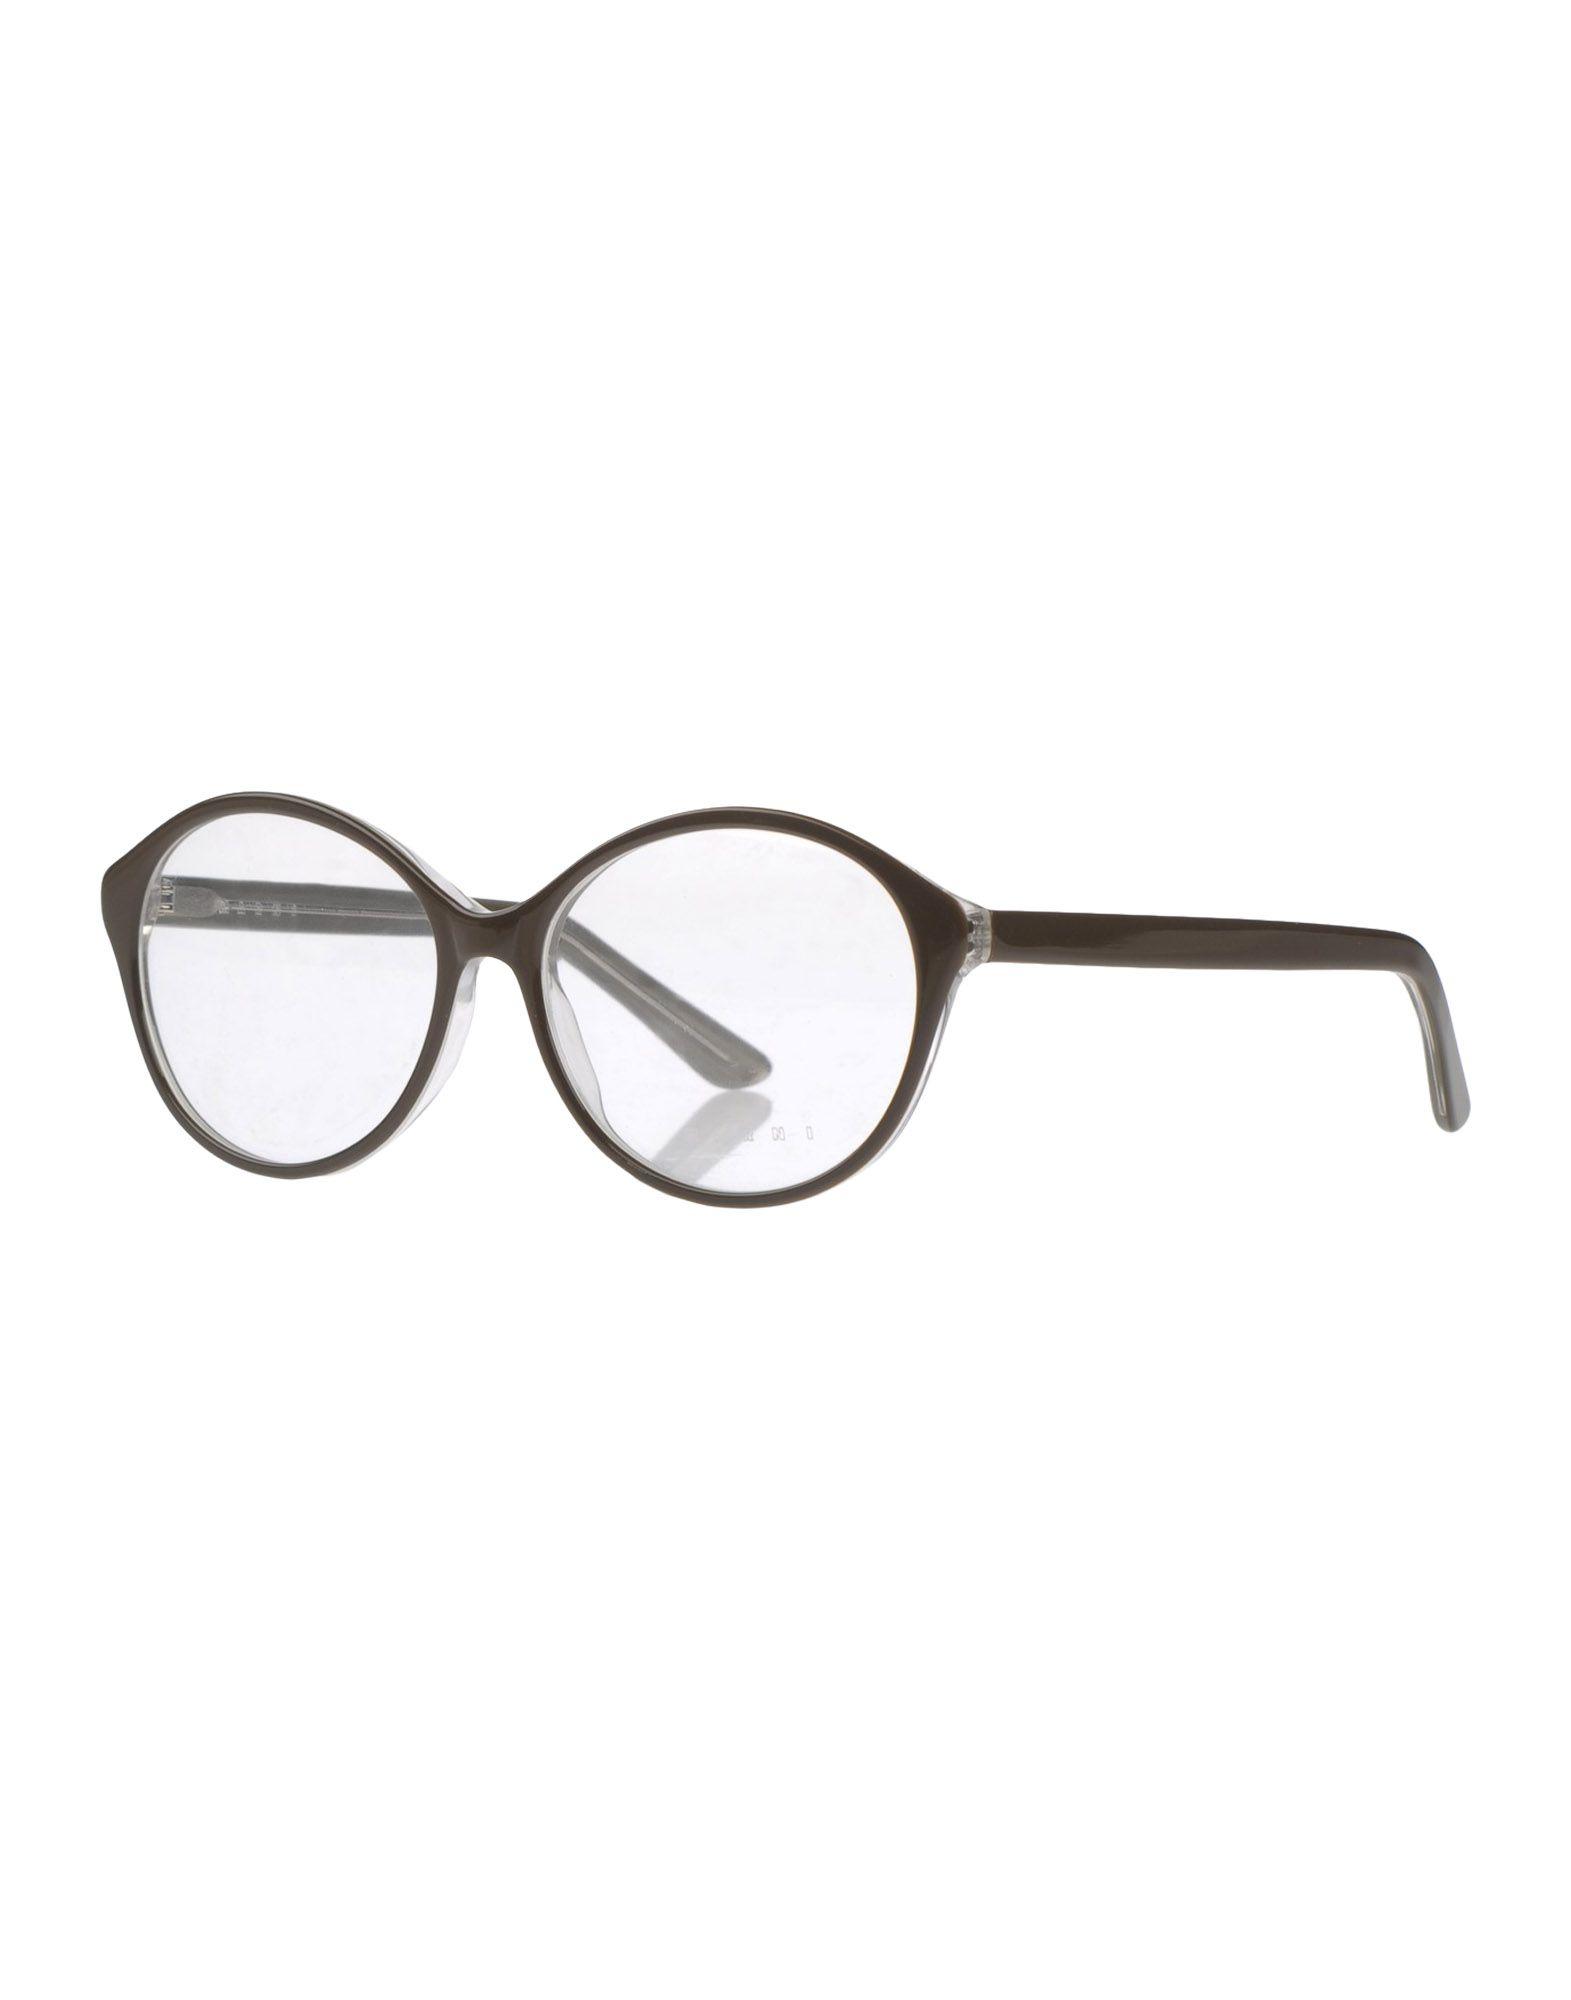 MARNI Damen Brille Farbe Dunkelgrün Größe 1